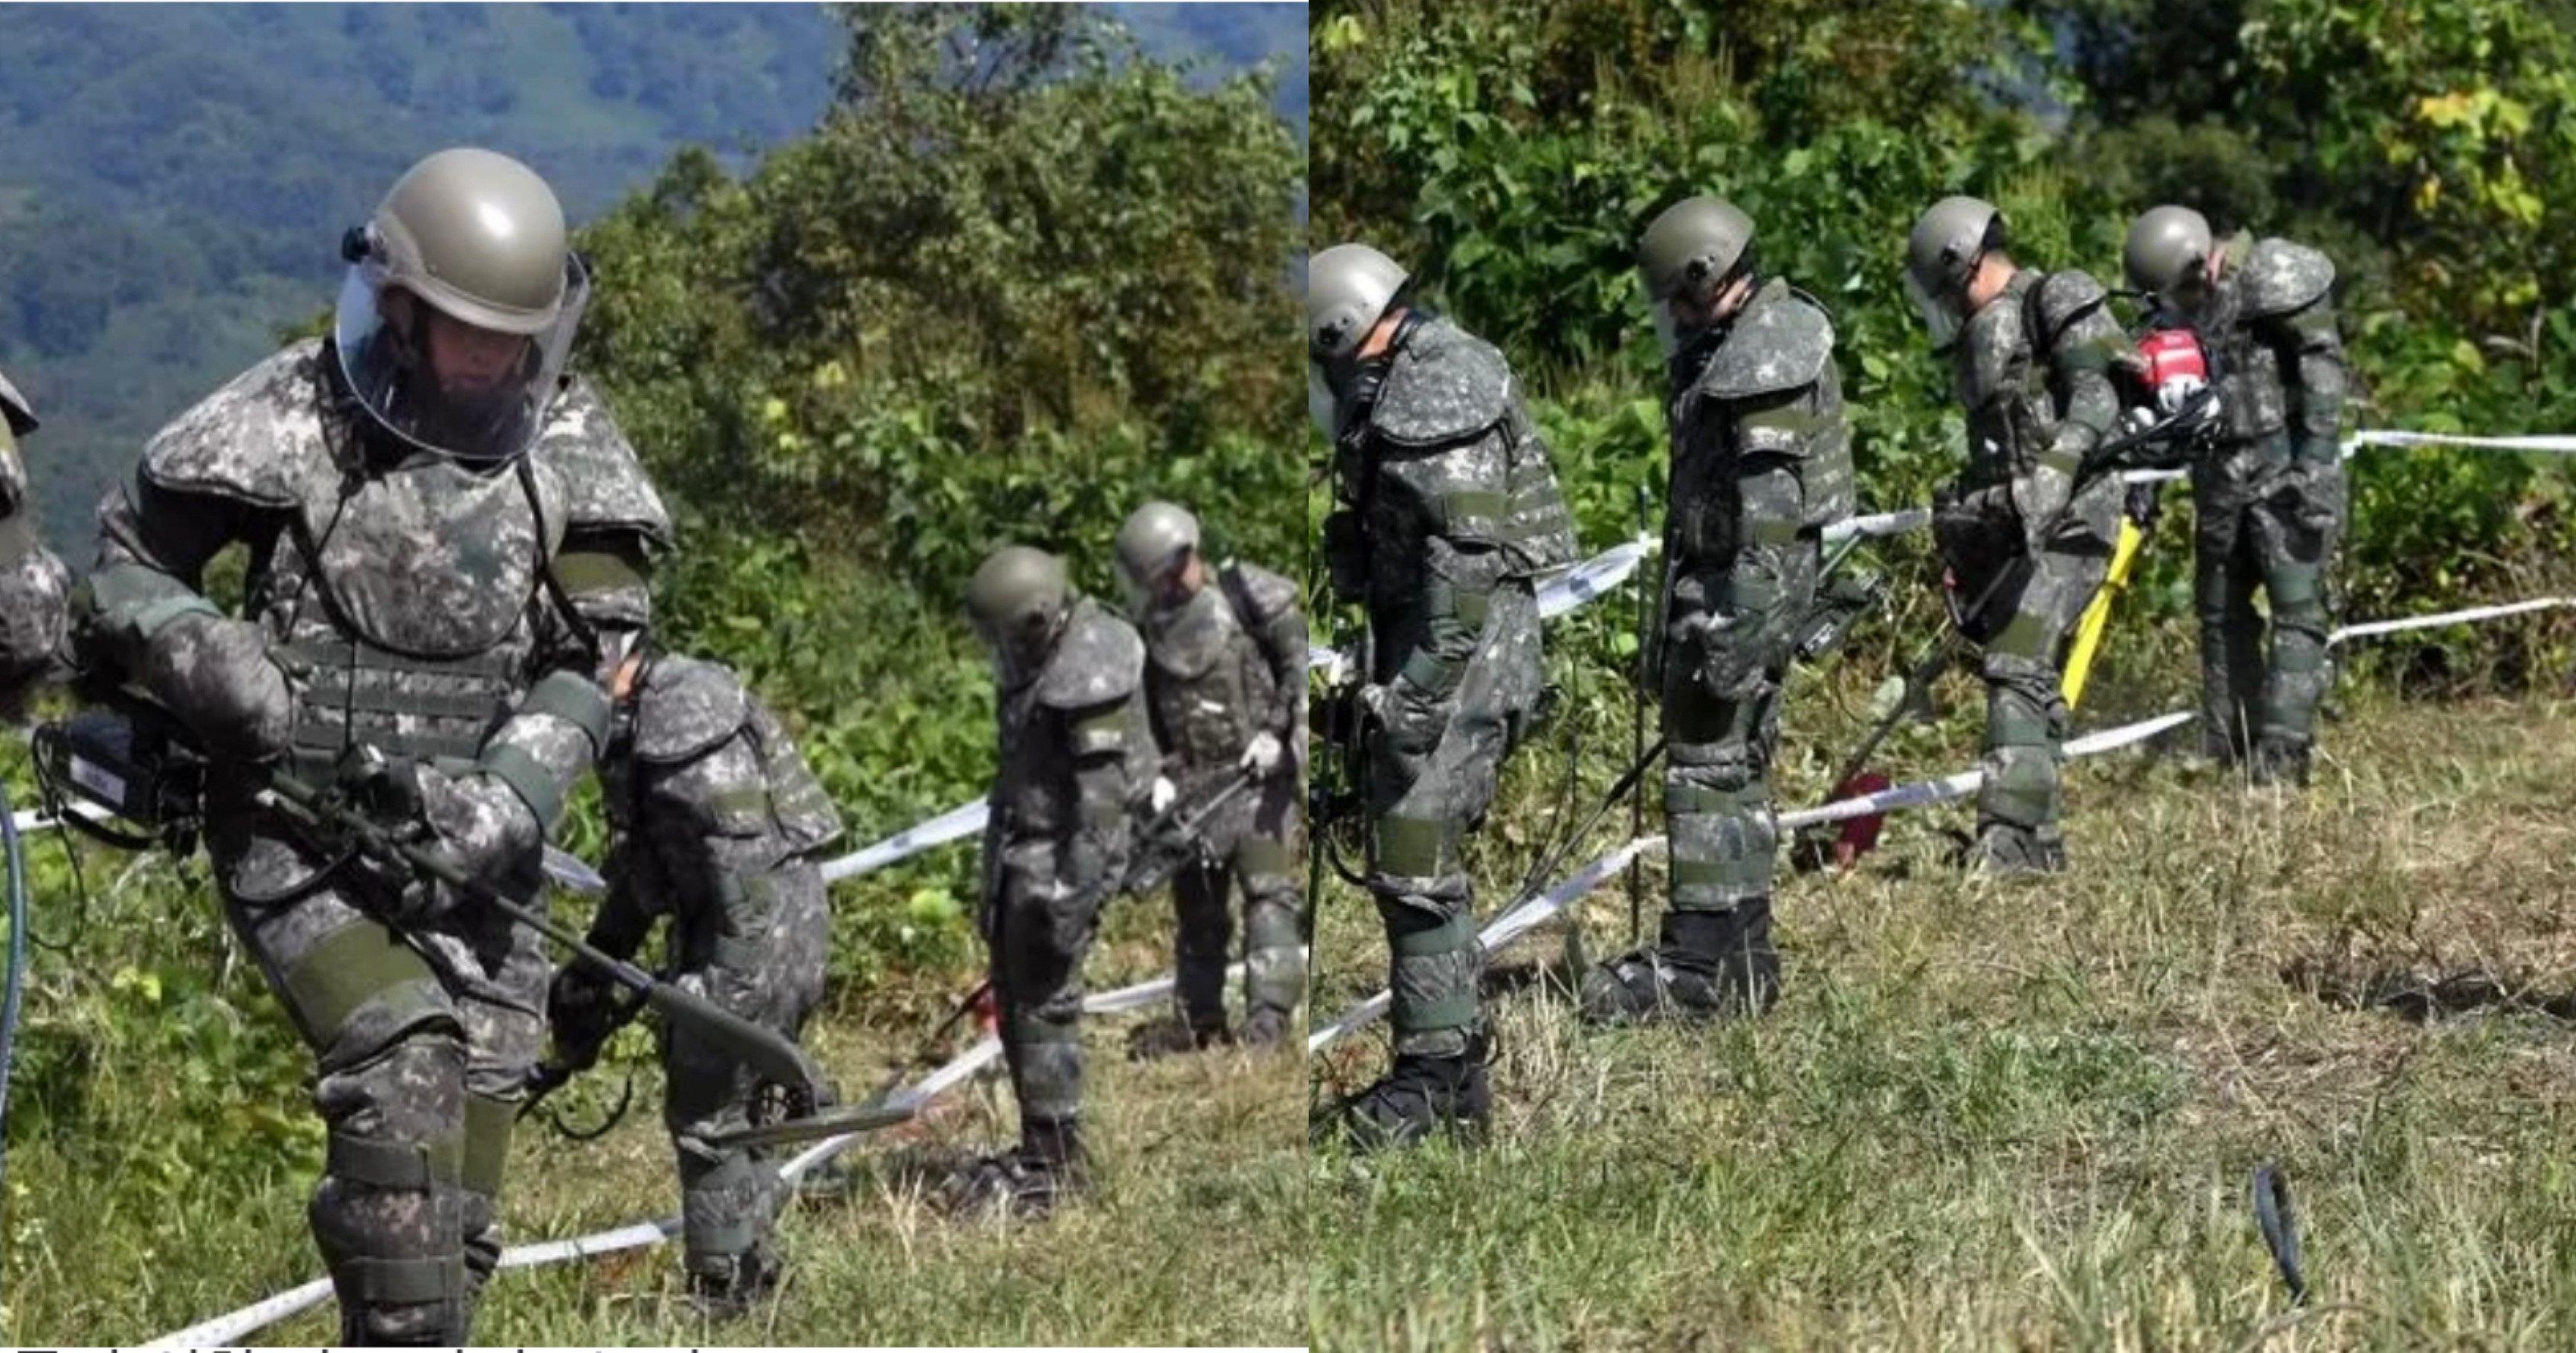 "5ad56749 4be4 4eb7 a142 384e44d5dfab.jpeg?resize=1200,630 - ""이 더운날에..""북한이 묻어 놓은 지뢰 수색하는 군인들이 '폭염주의보' 속에도 입어야 하는 방호복 수준(+사진)"